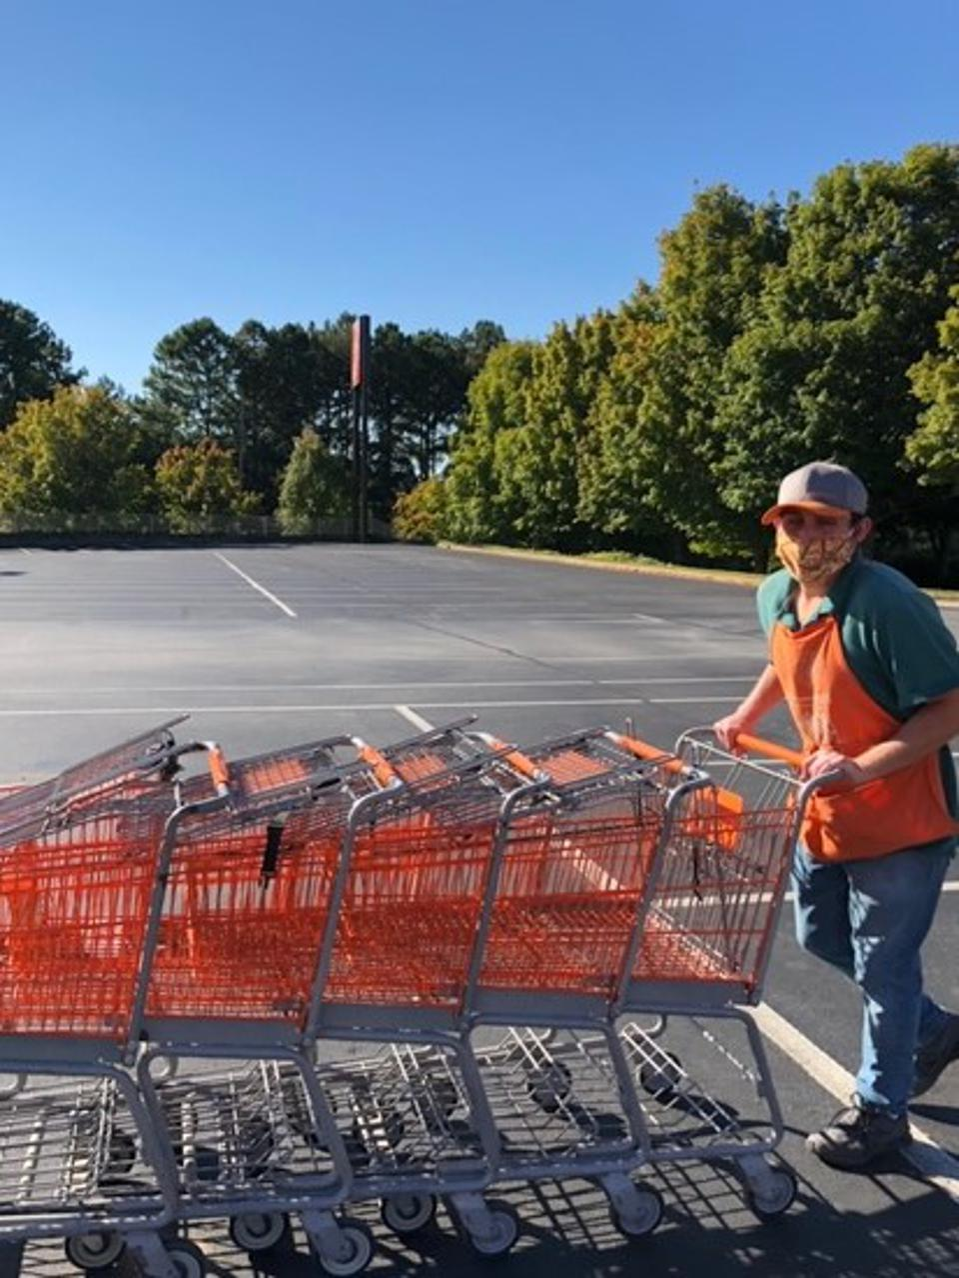 Noah Roberts of Ken's Krew at Home Depot working during the pandemic